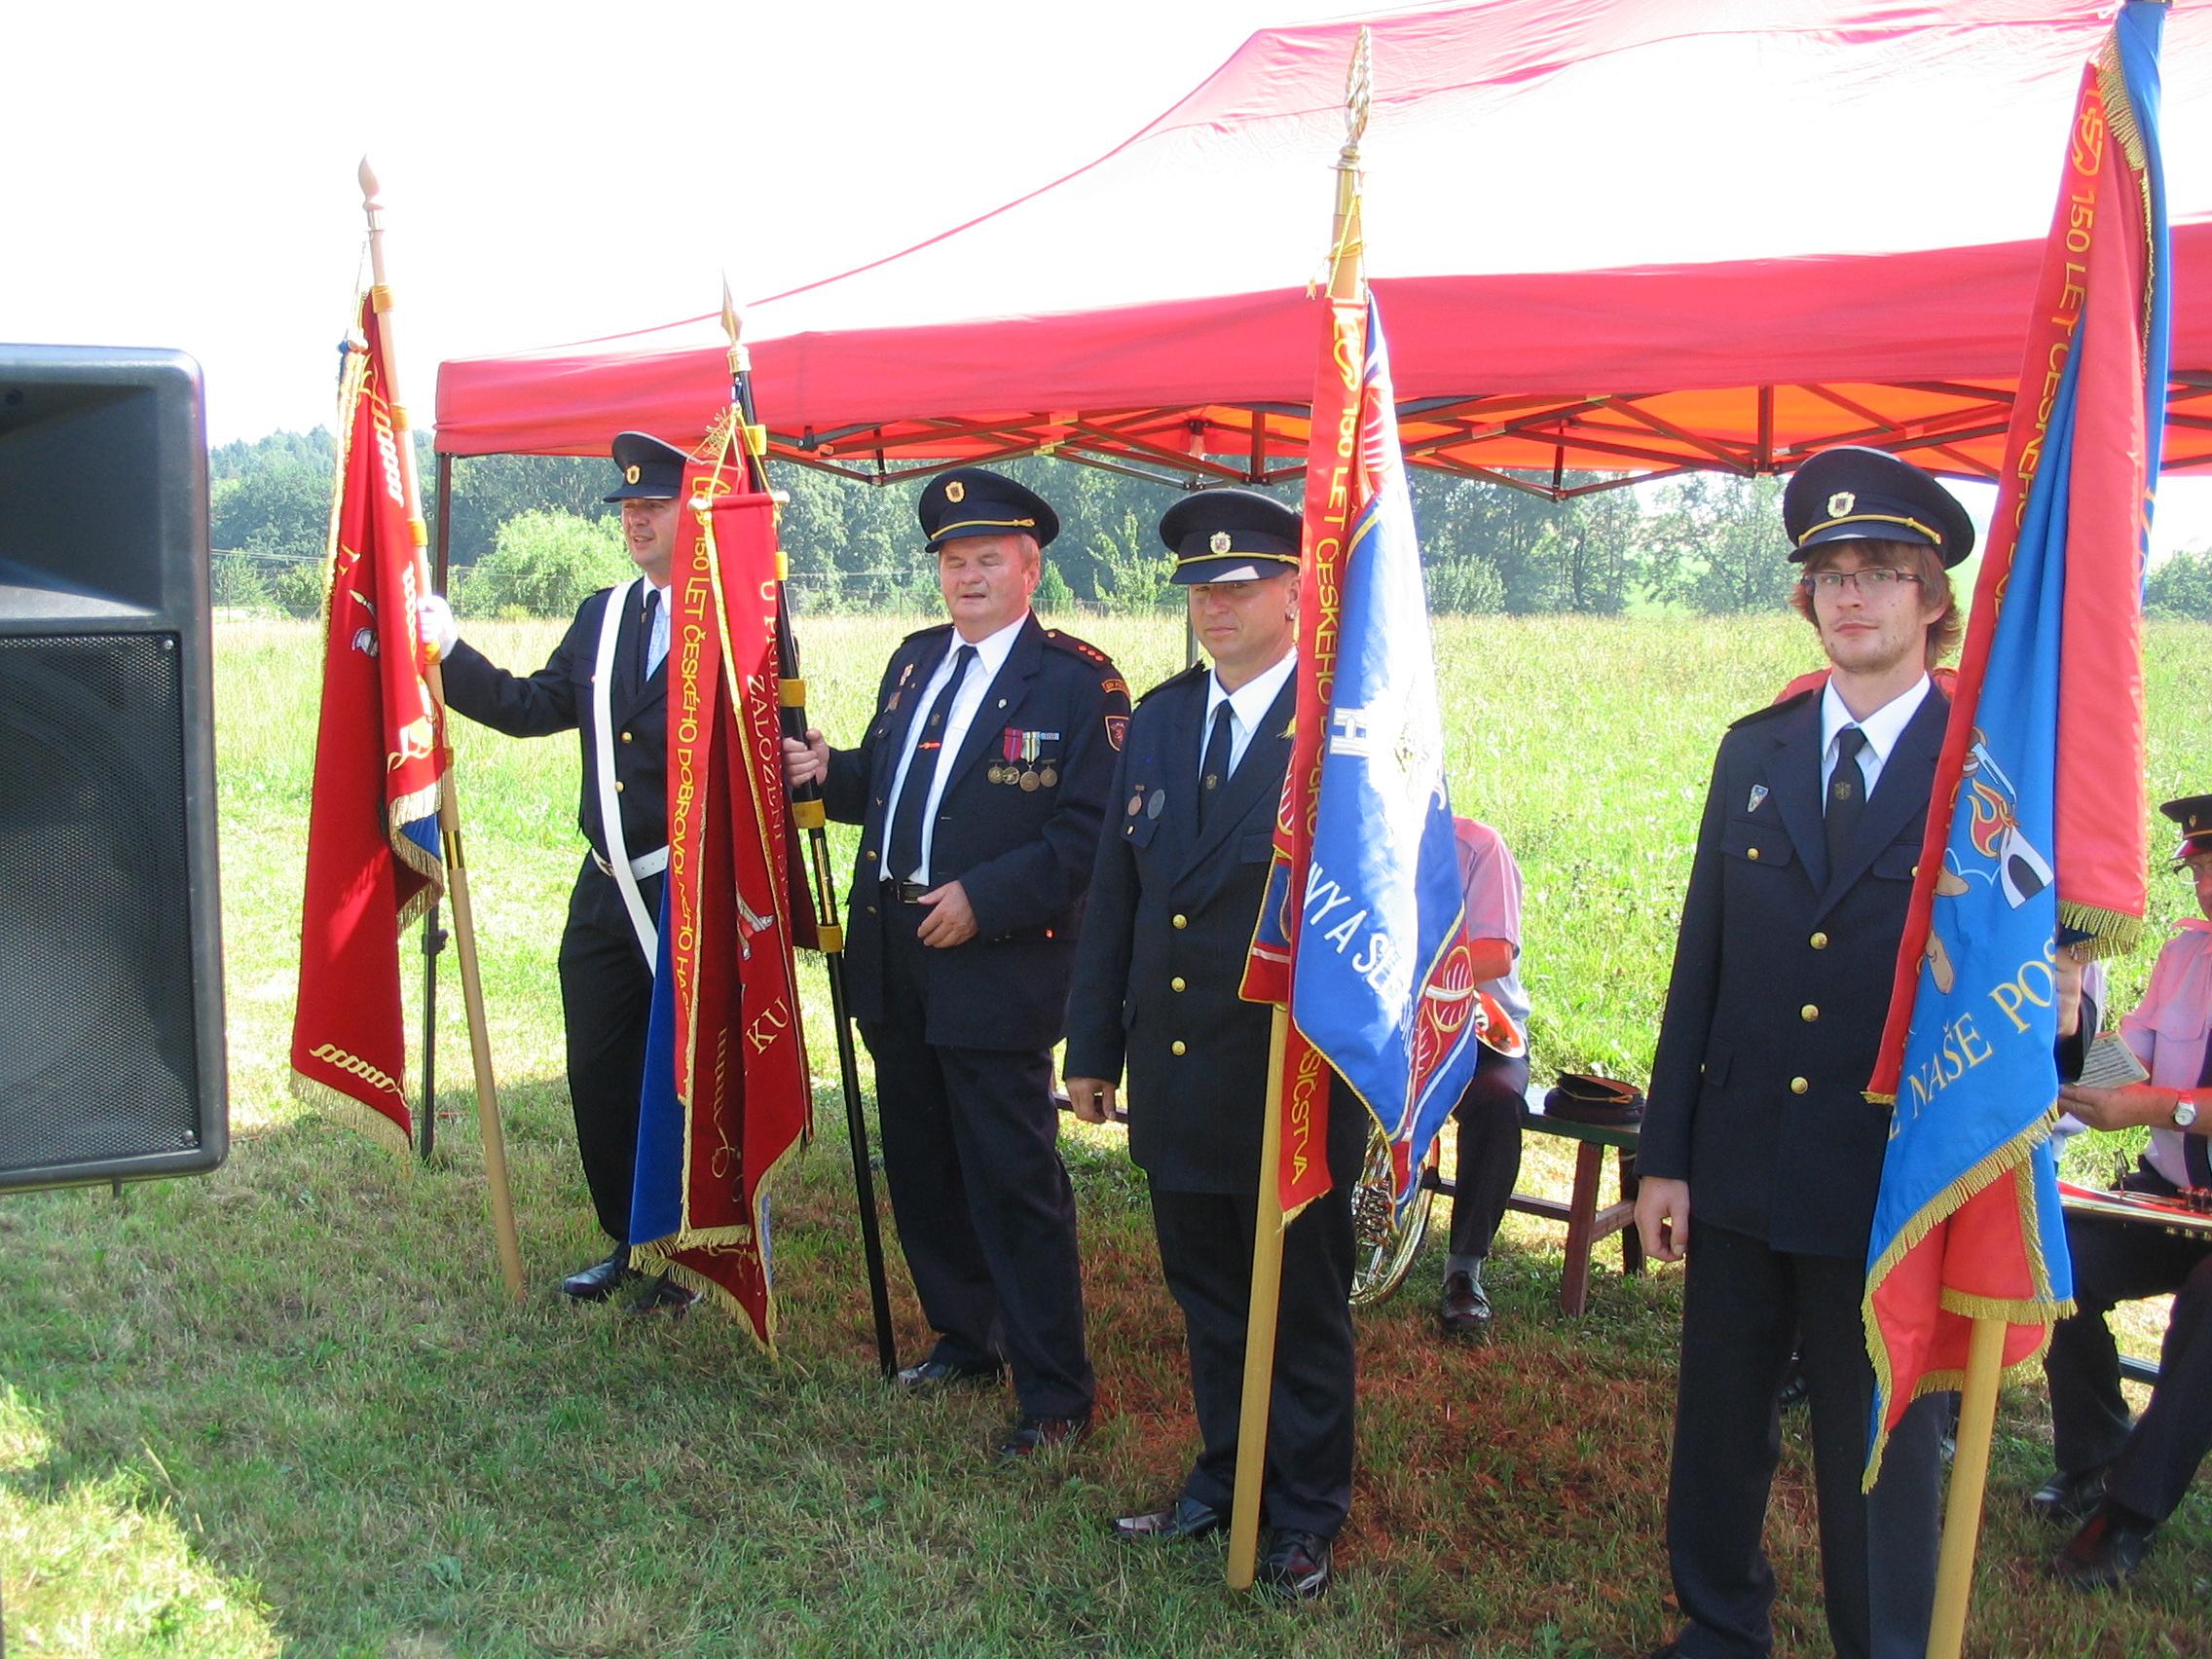 Oslavy SDH Lhota u Choryně - 80 let